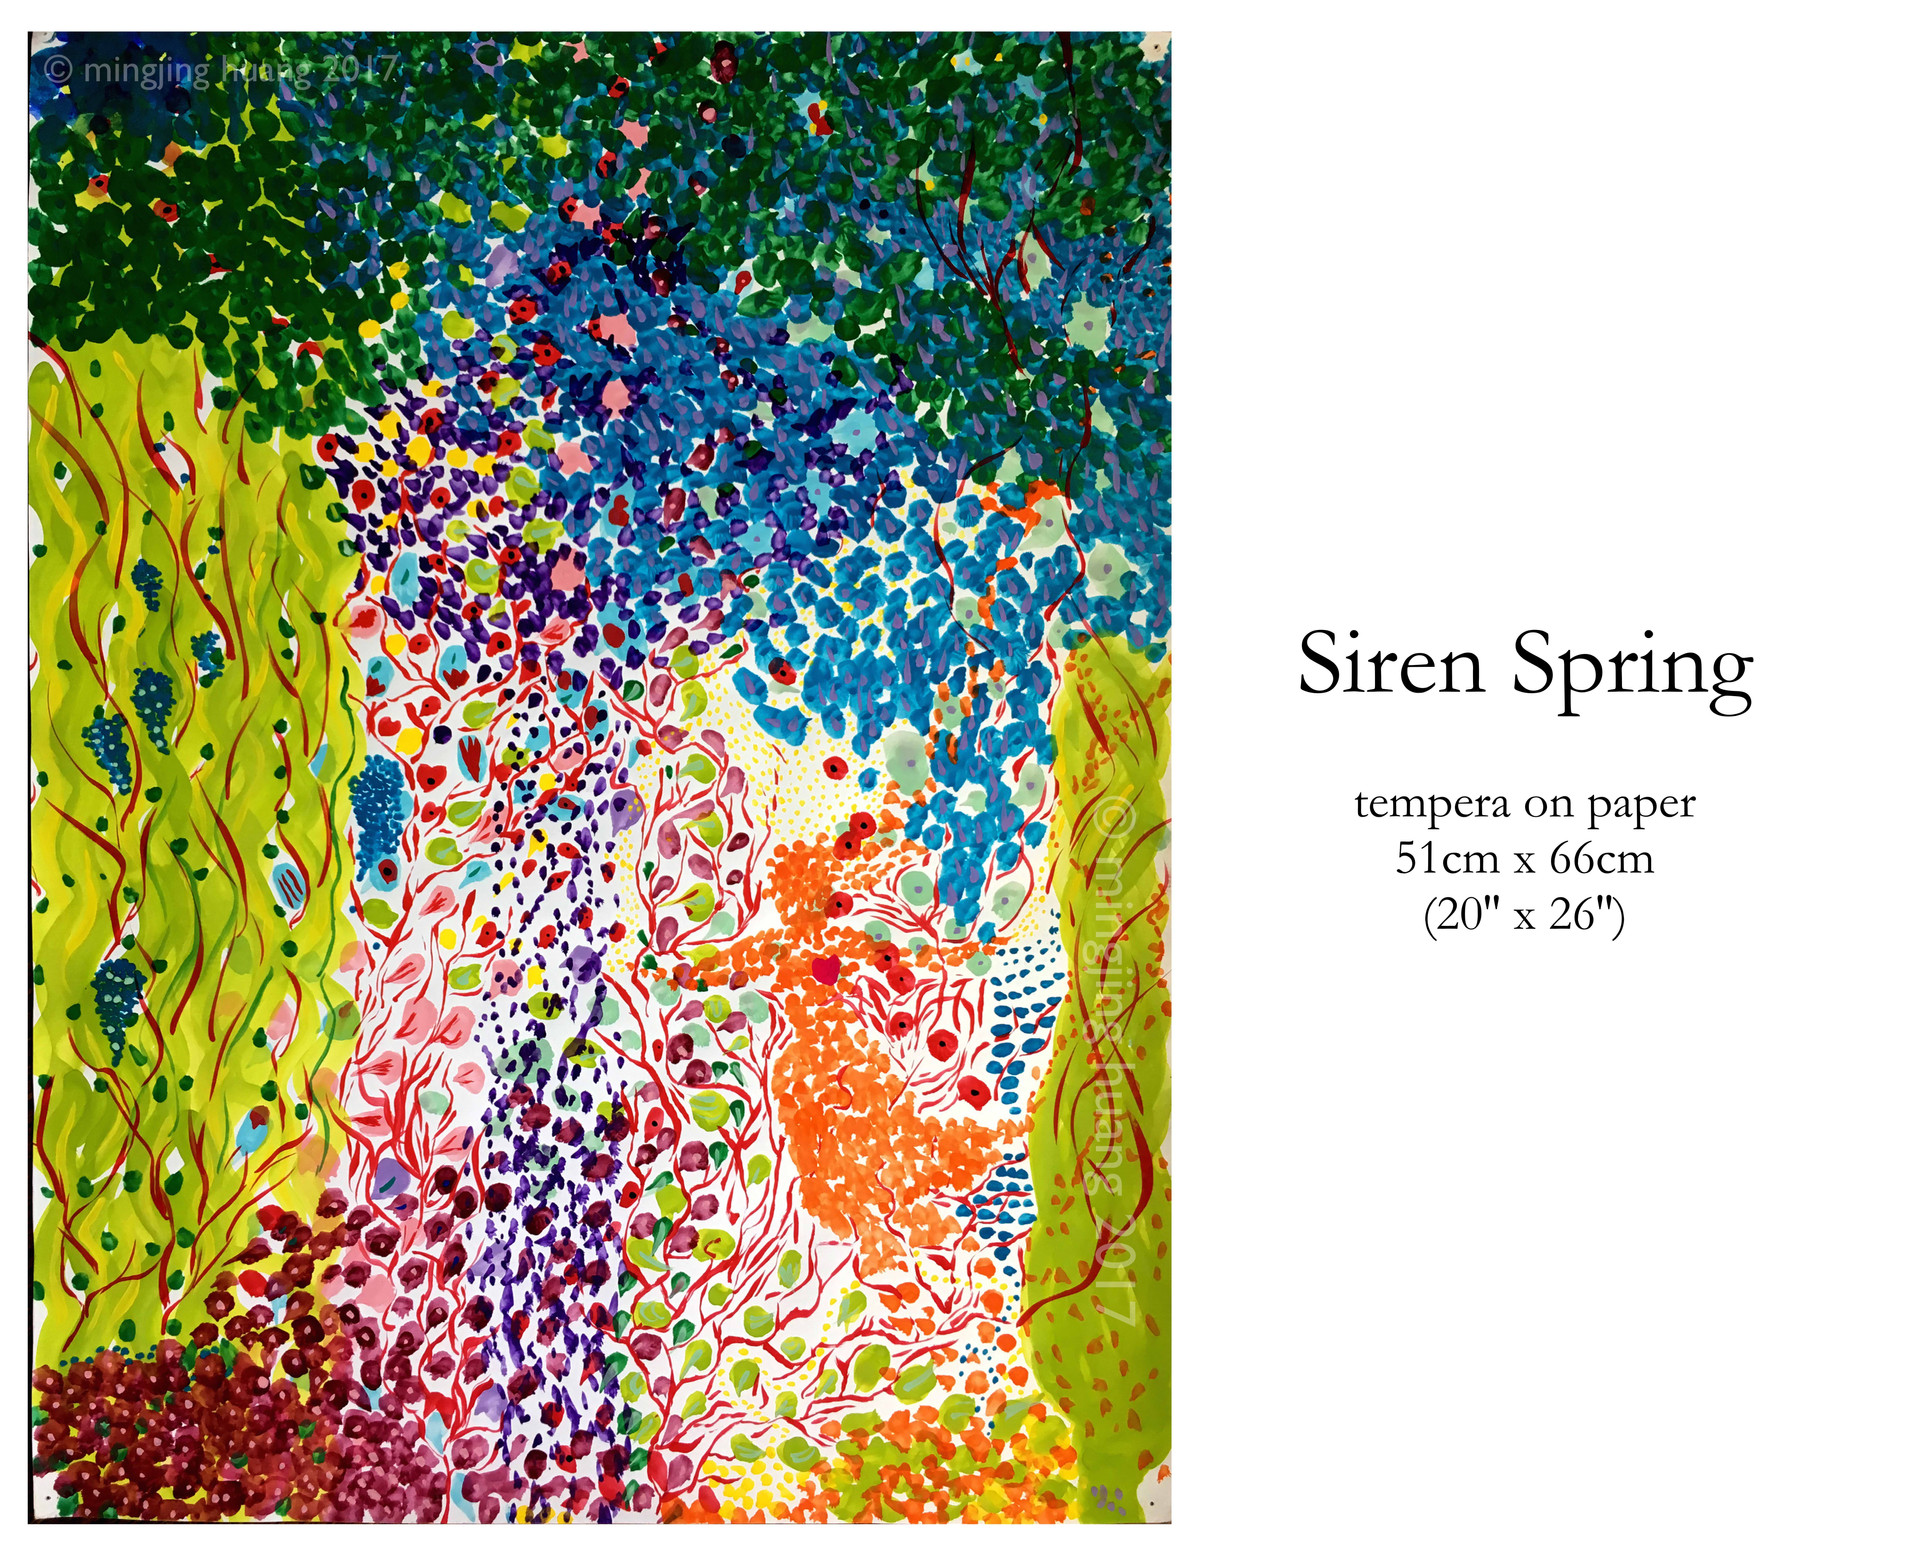 Siren Spring